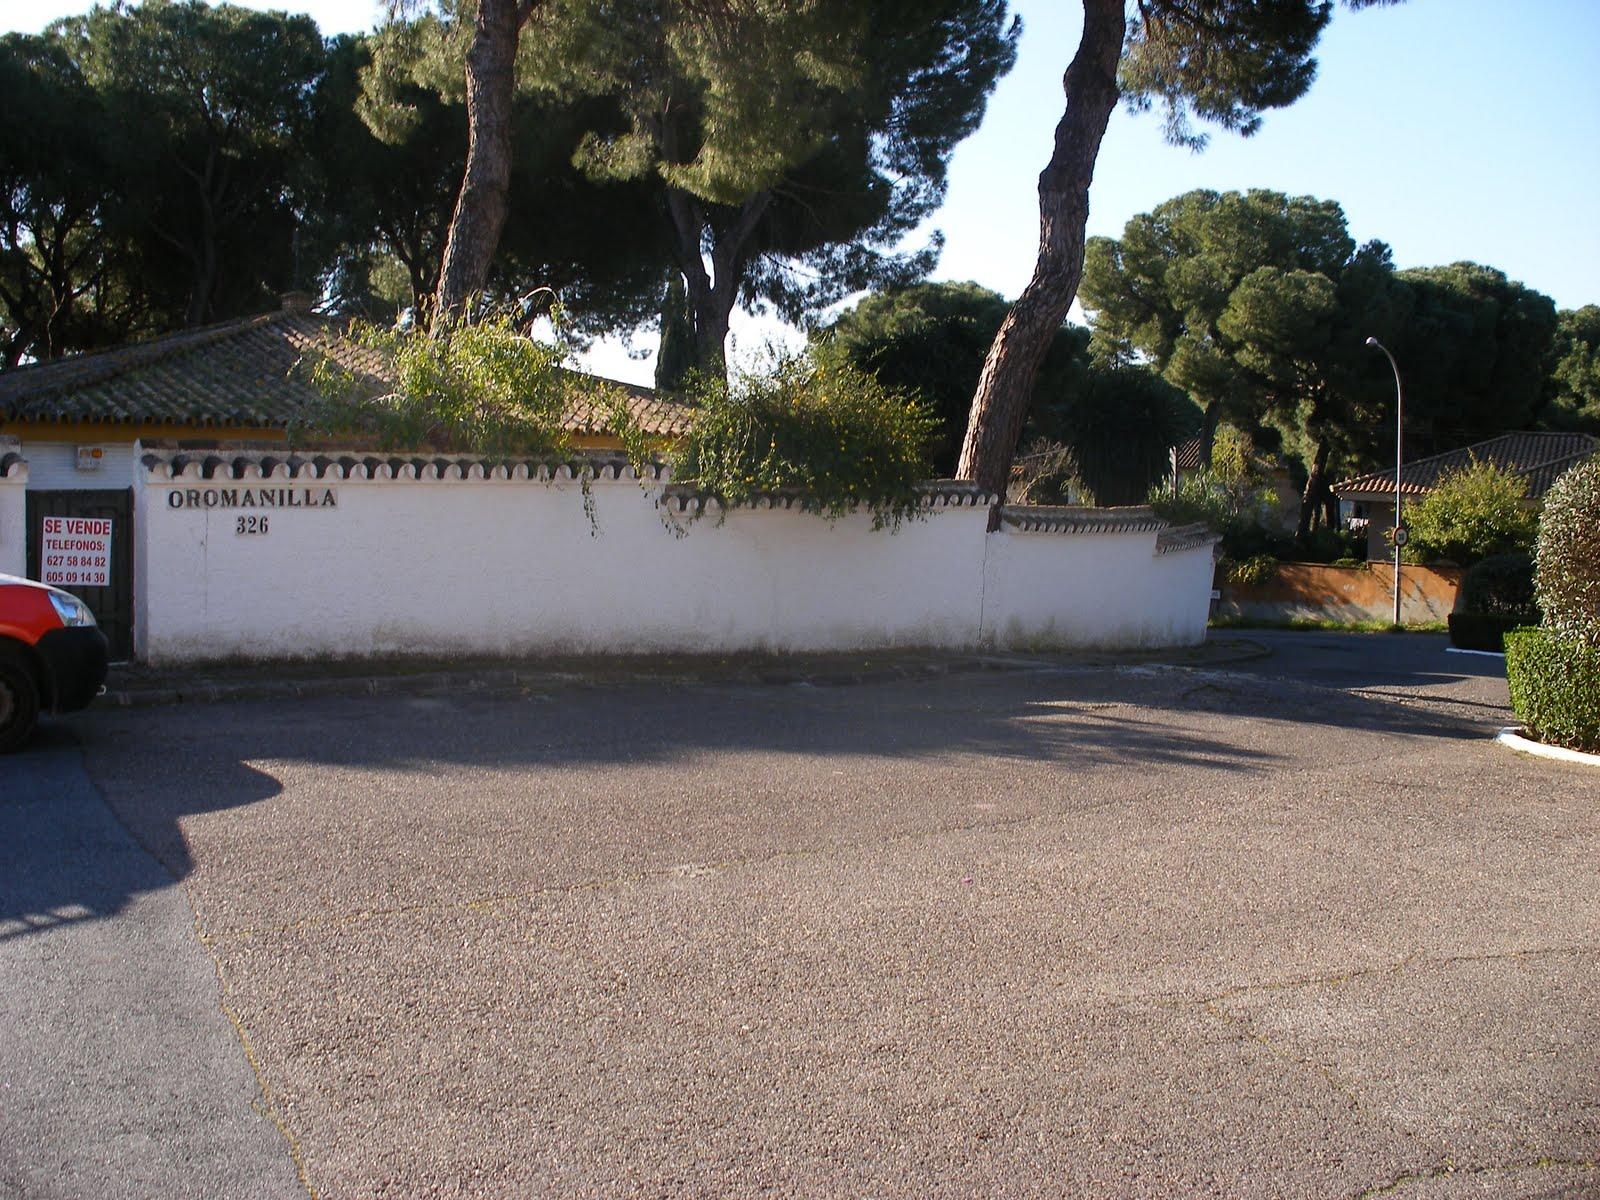 Chalet oromanila fotos del exterior de la parcela - Fotos de parcelas ...